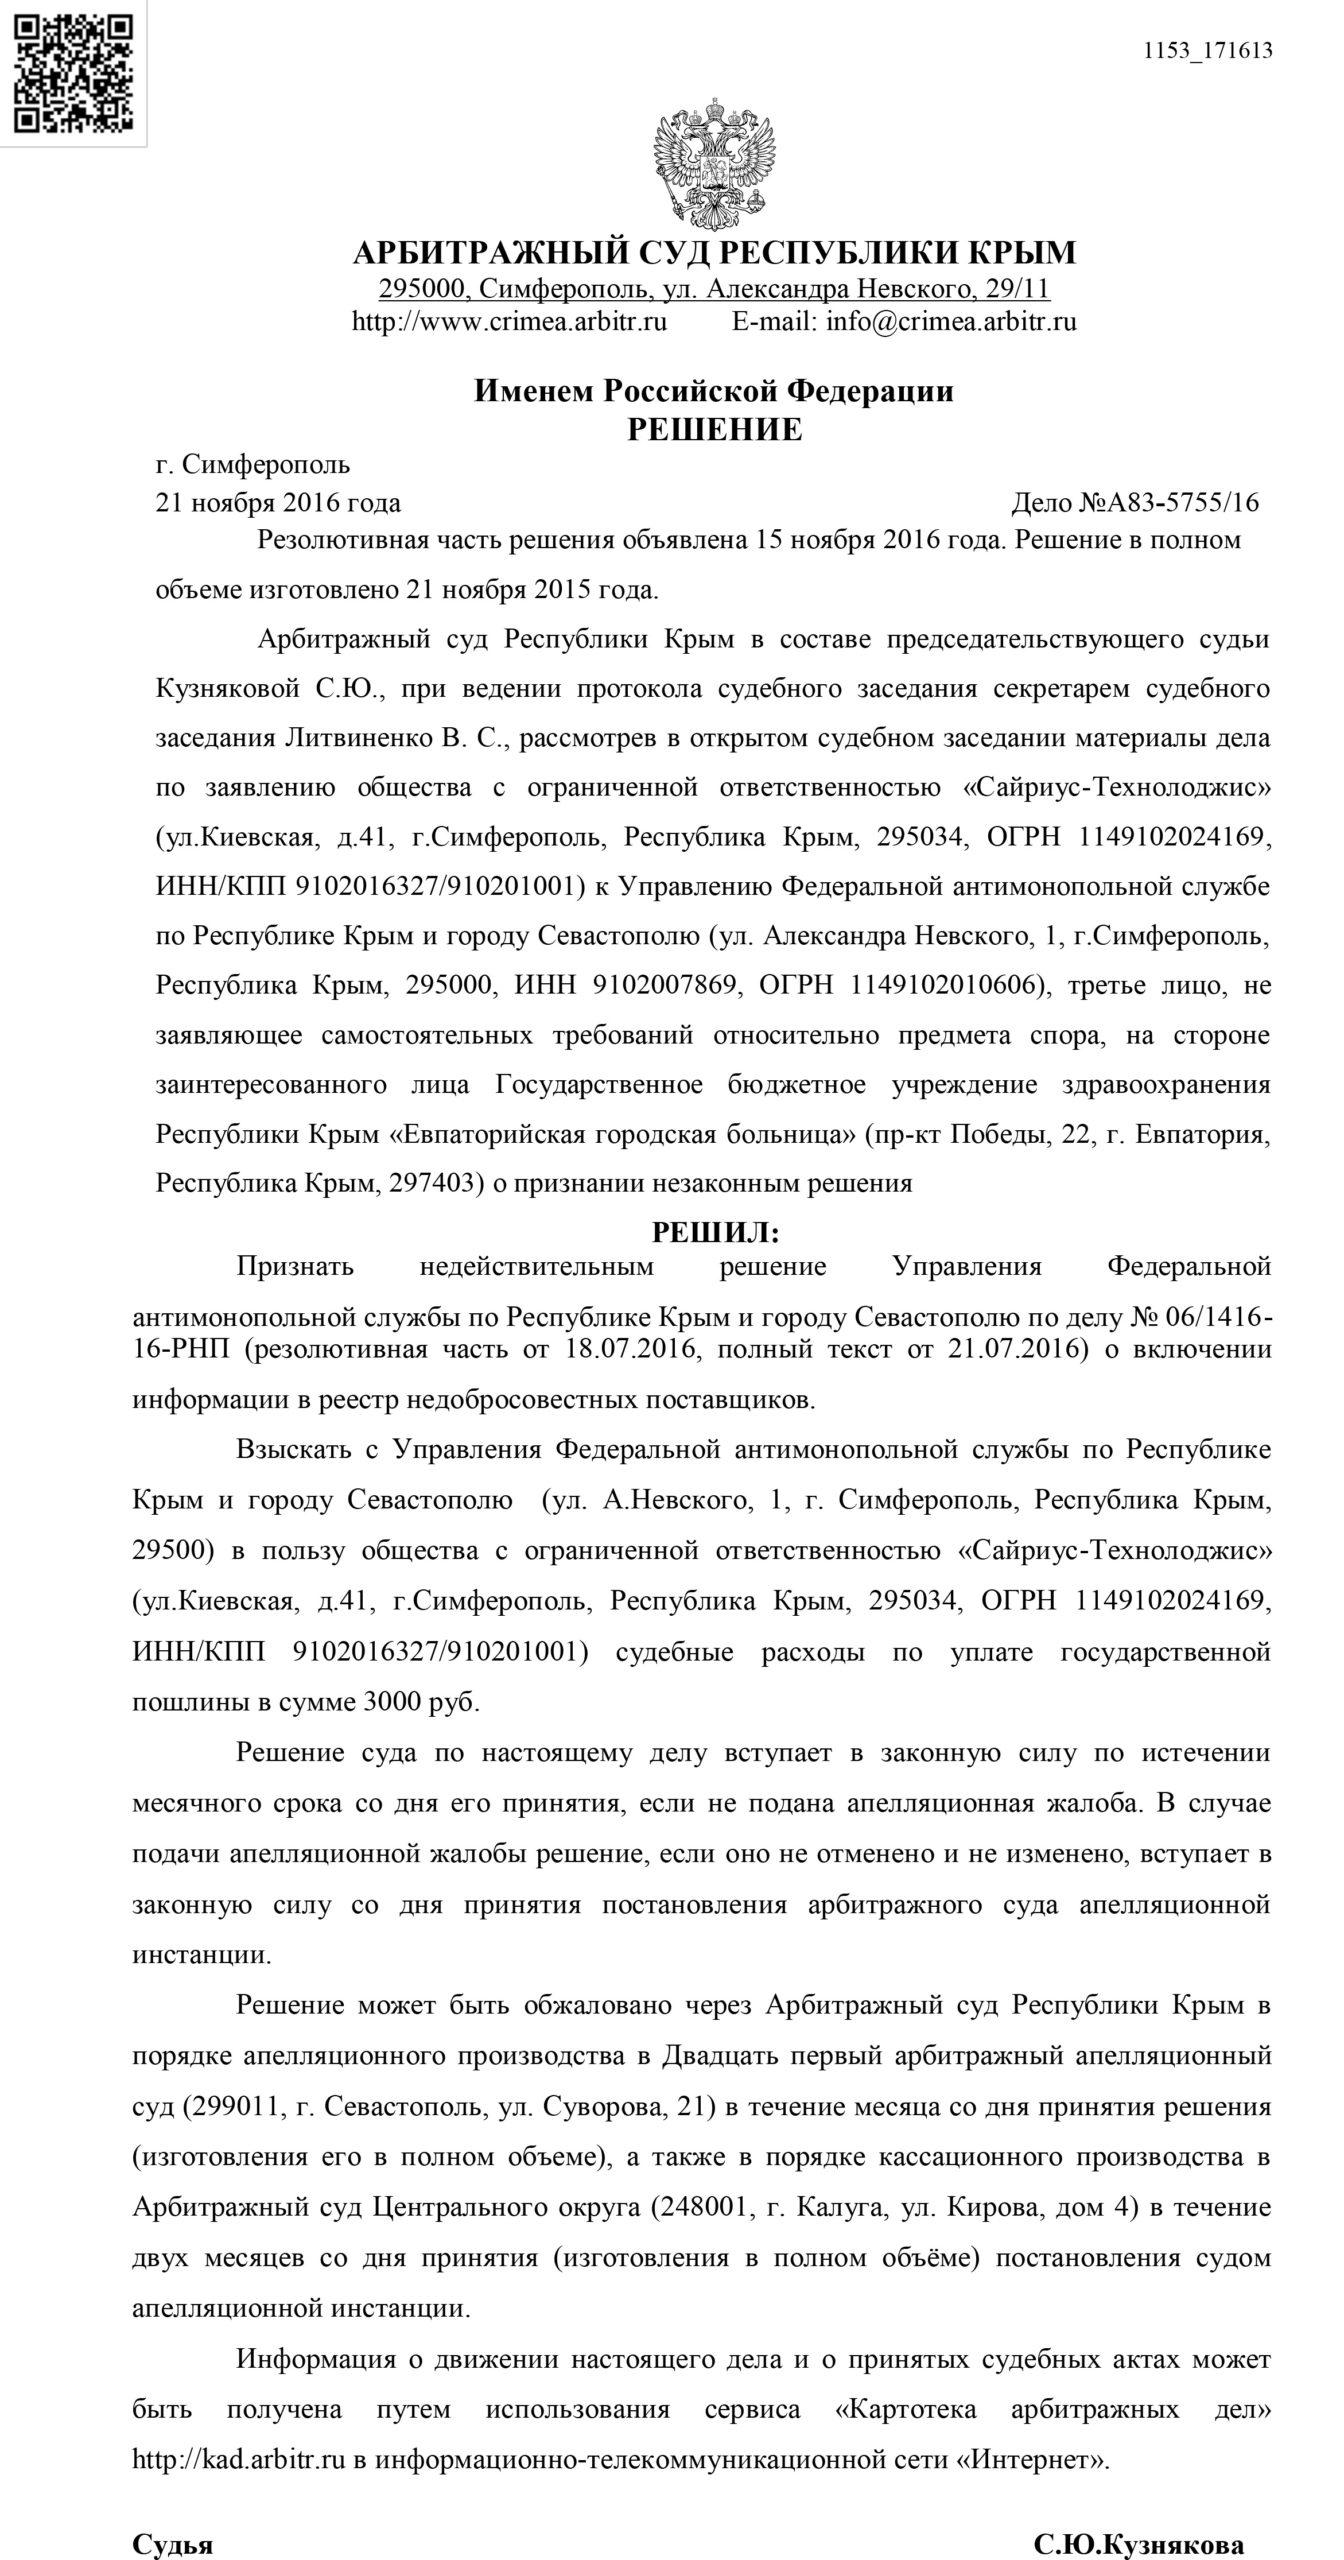 АС Крым Сайрус-Технолоджис A83-5755-2016_20161121_Reshenija i postanovlenija-1